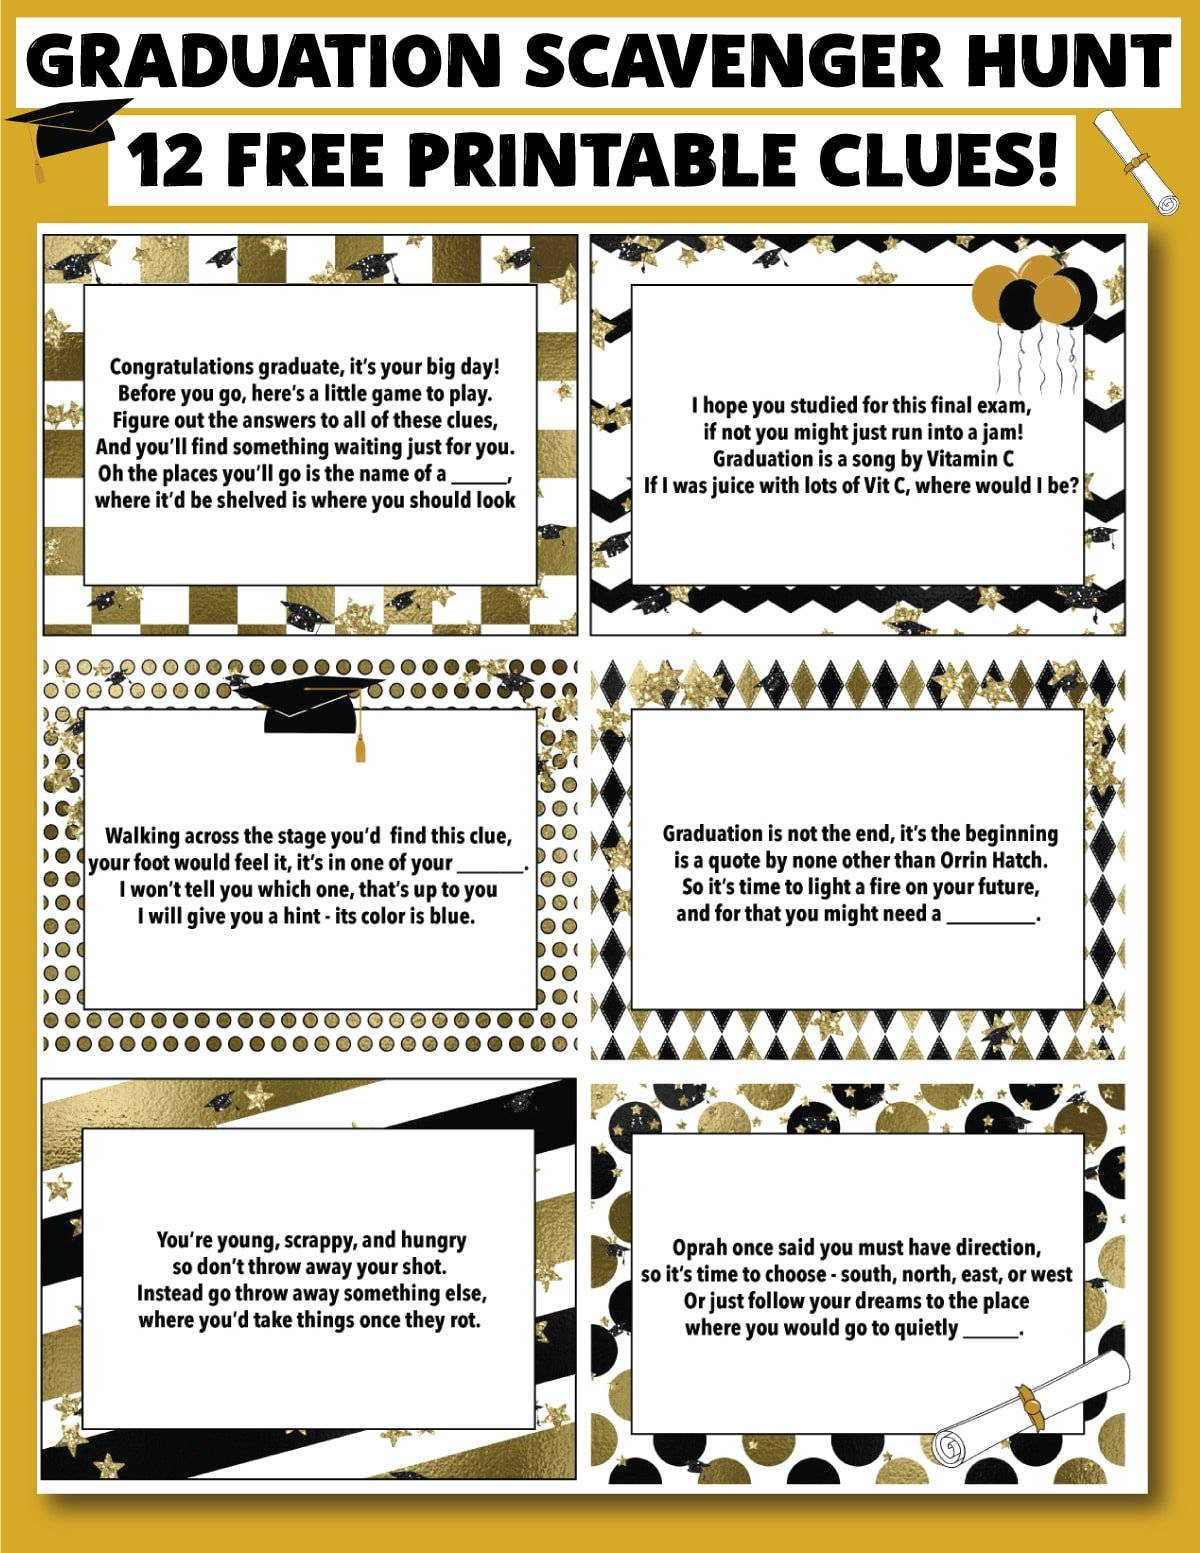 graduation scavenger hunt clues on a gold background